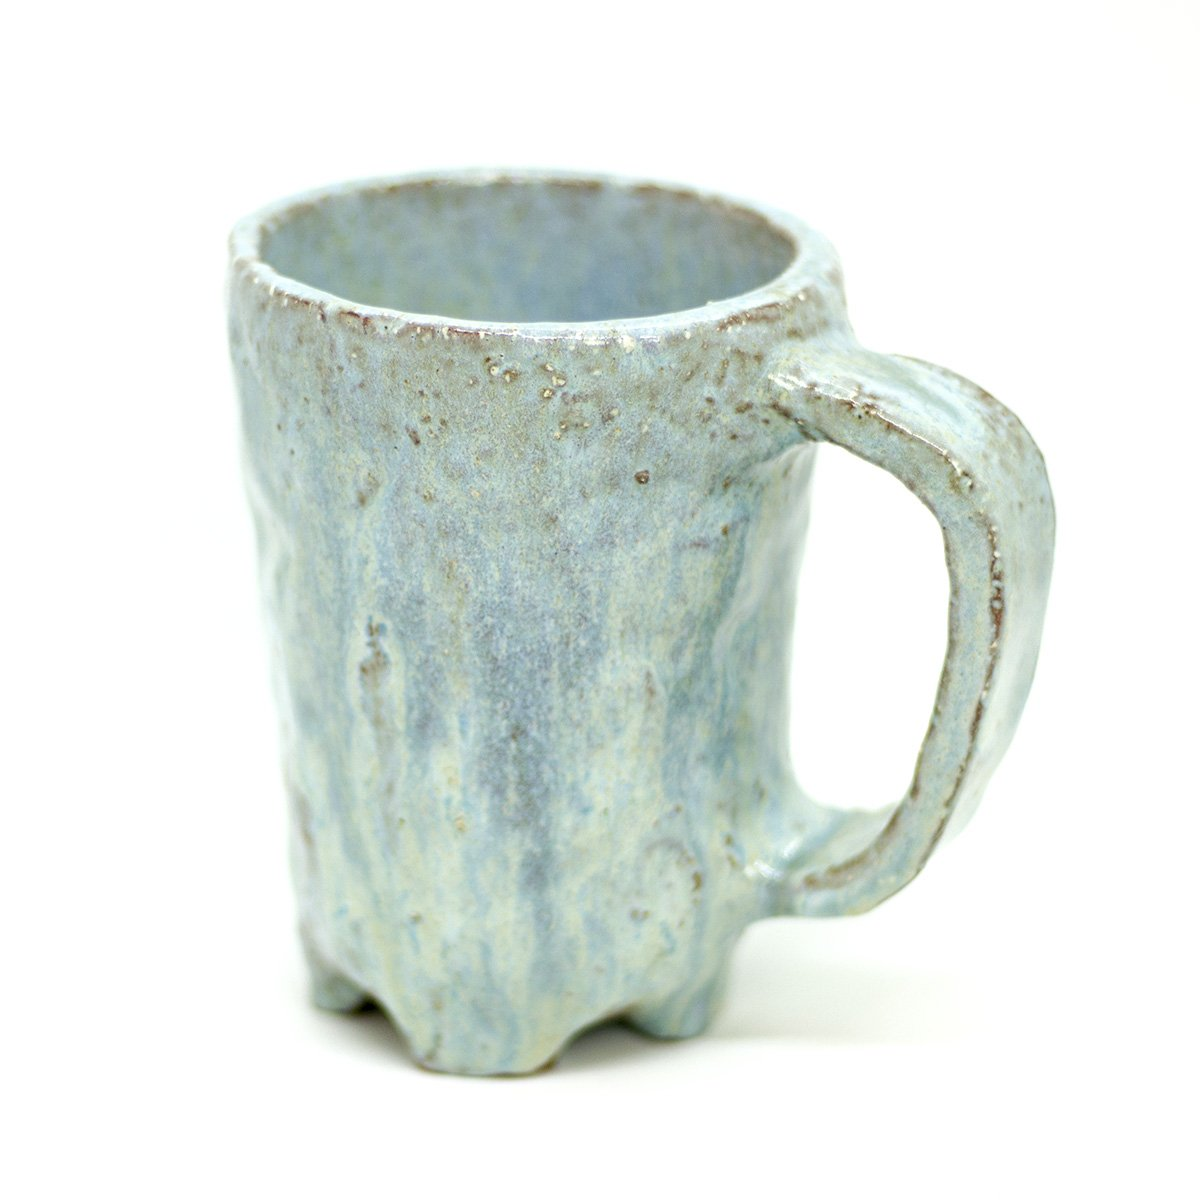 handgemaakte mok mokken koffiemok handmade mug